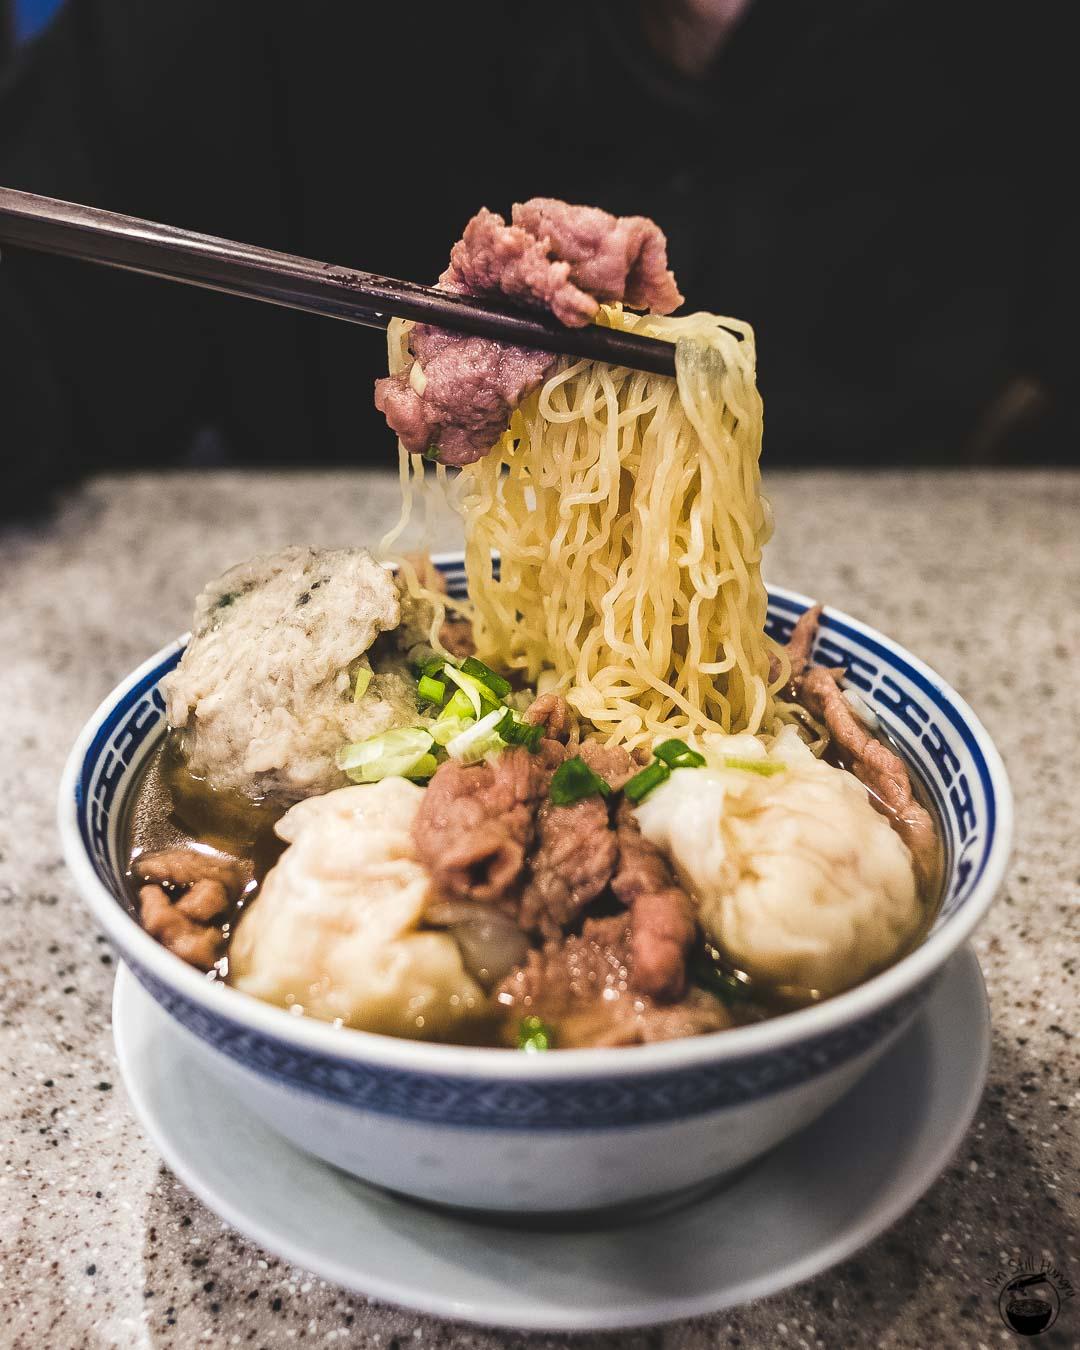 Tsim Chai Kee Hong Kong Three topping wonton noodles - beef, fish ball, prawn wontons